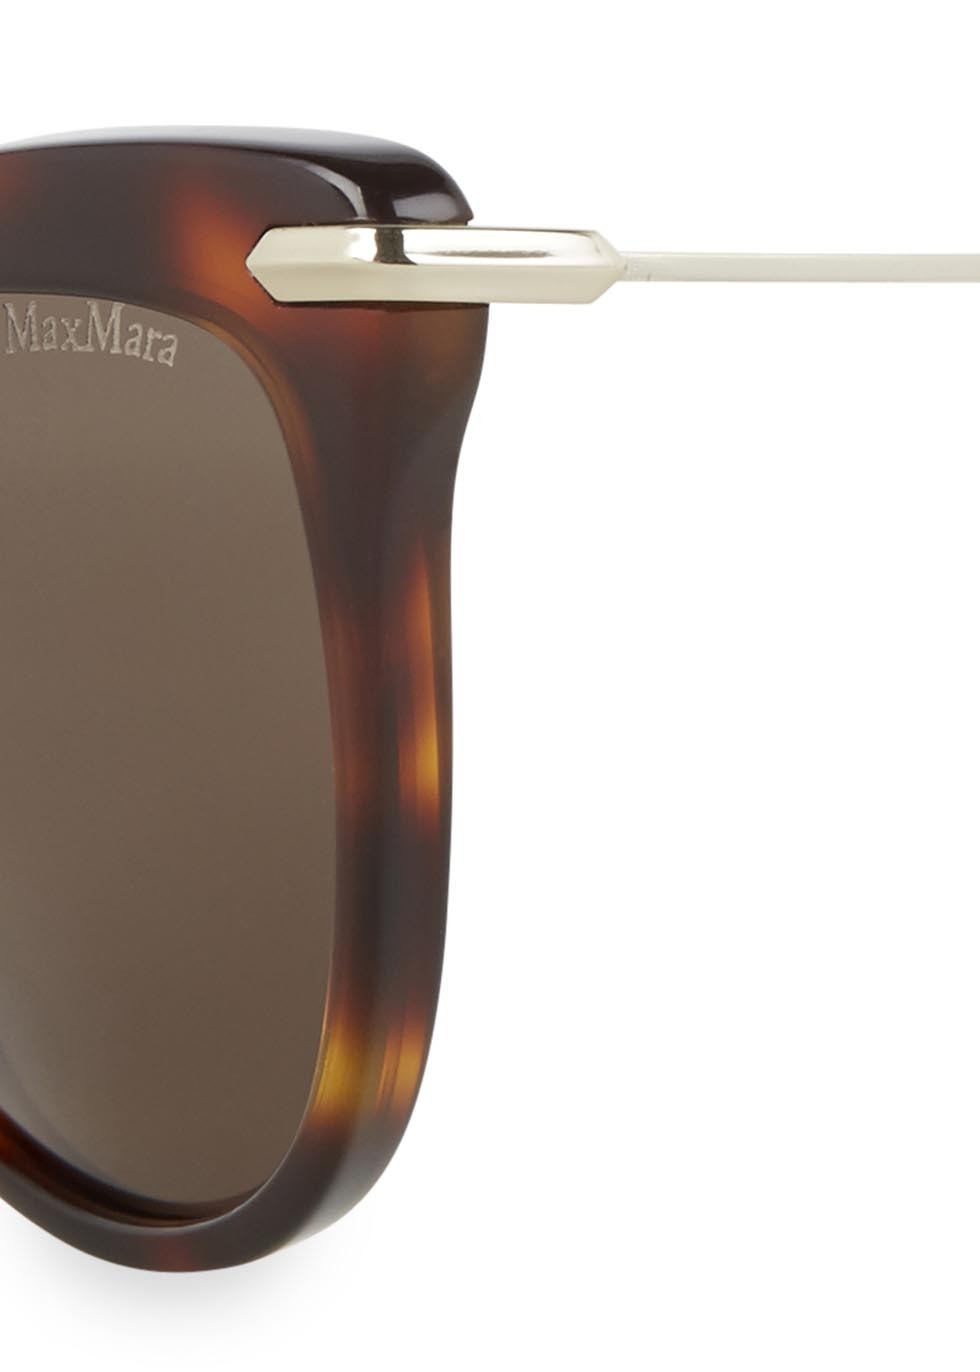 ddbafb2ed37f Max Mara Edgy Tortoiseshell Cat Eye Sunglasses in Metallic - Lyst